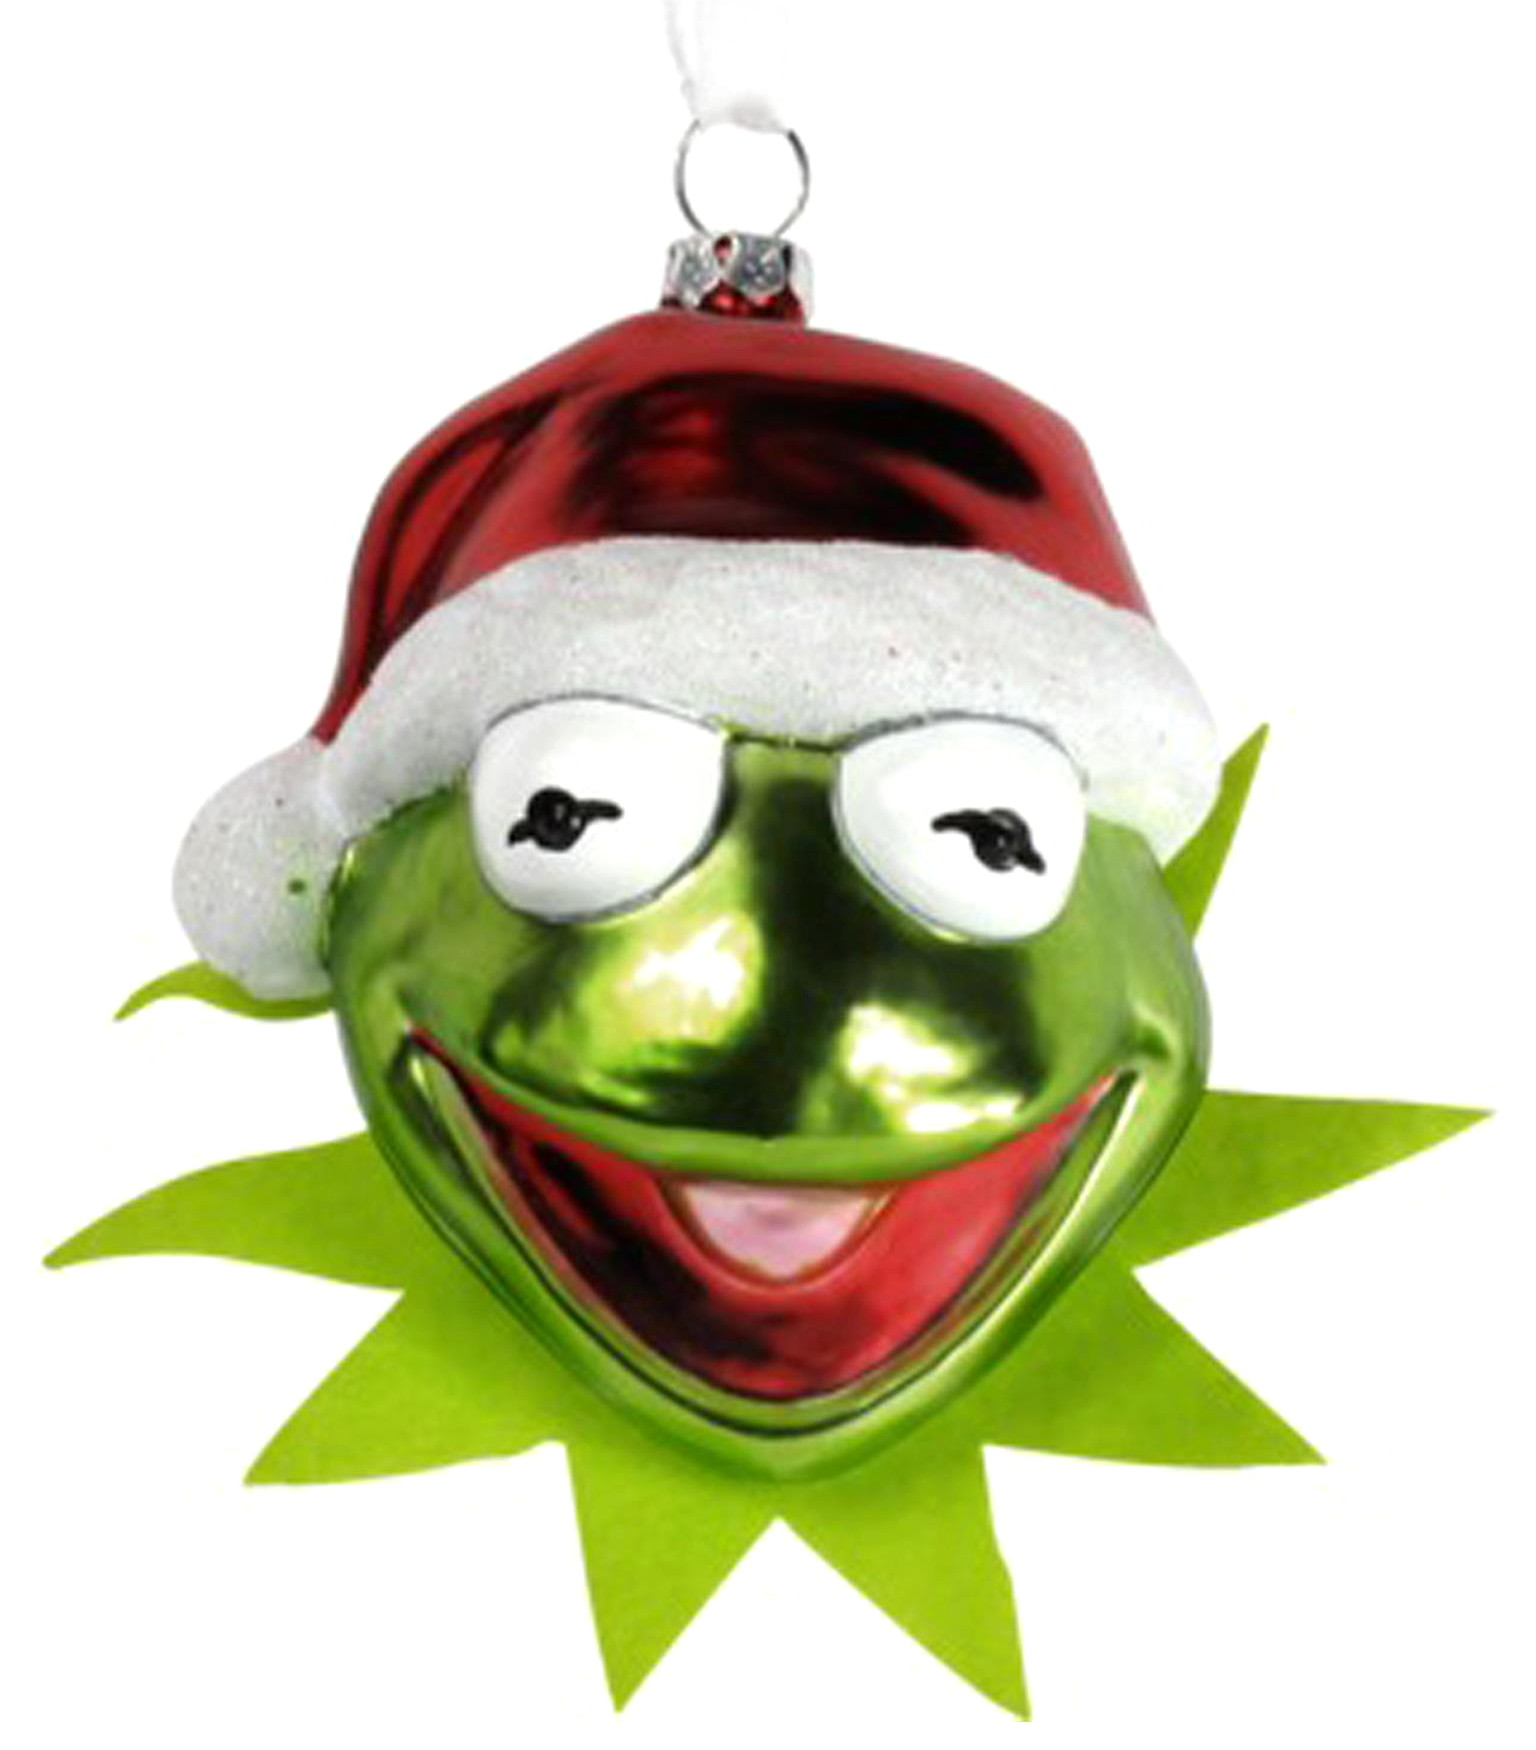 Muppet Christmas ornaments (Target) | Muppet Wiki | FANDOM powered ...